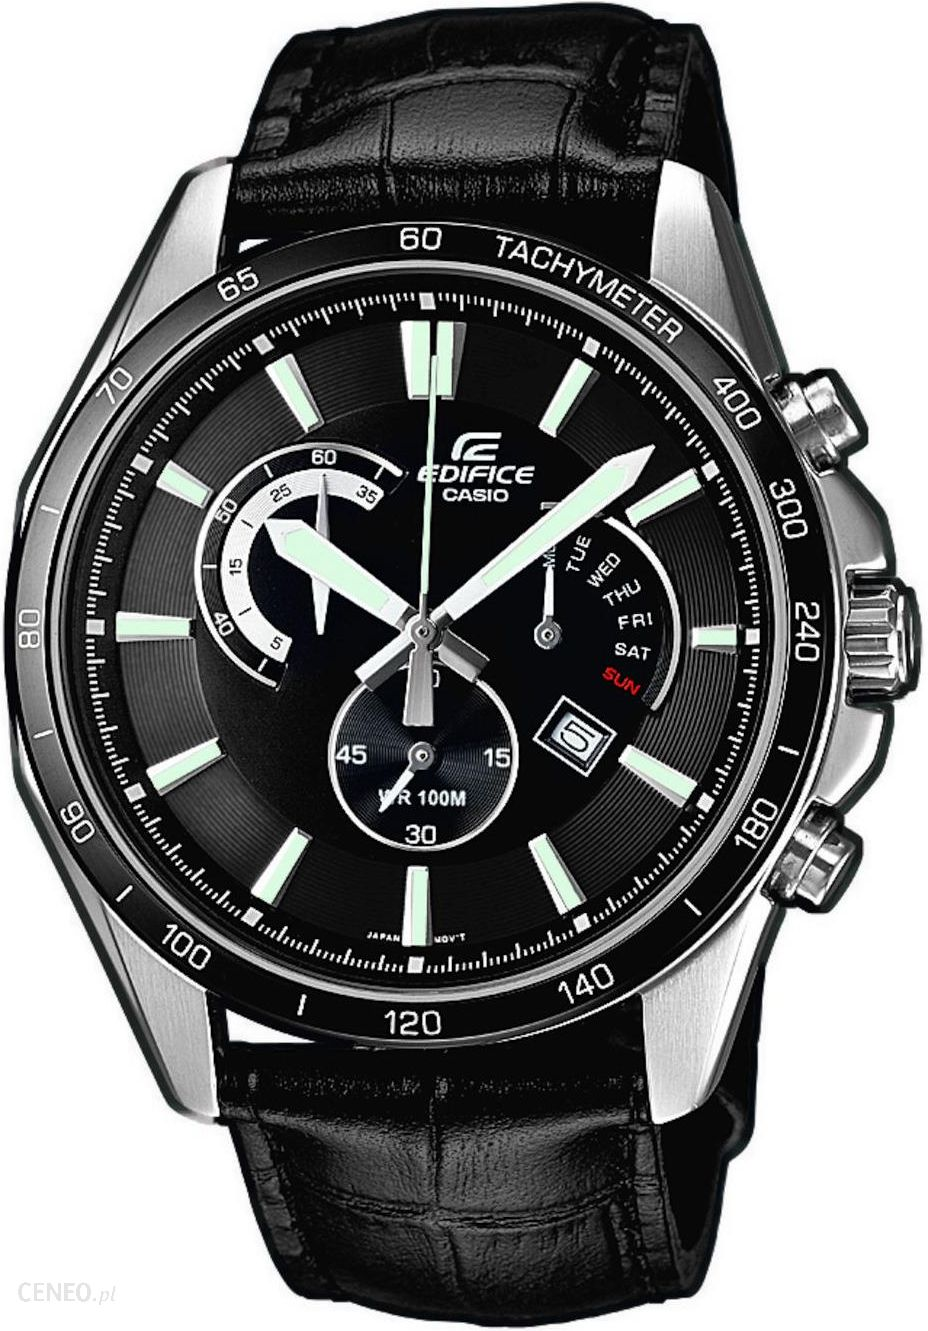 Zegarek męski CASIO EFR 549L 1AV 397,00 zł cena tanio